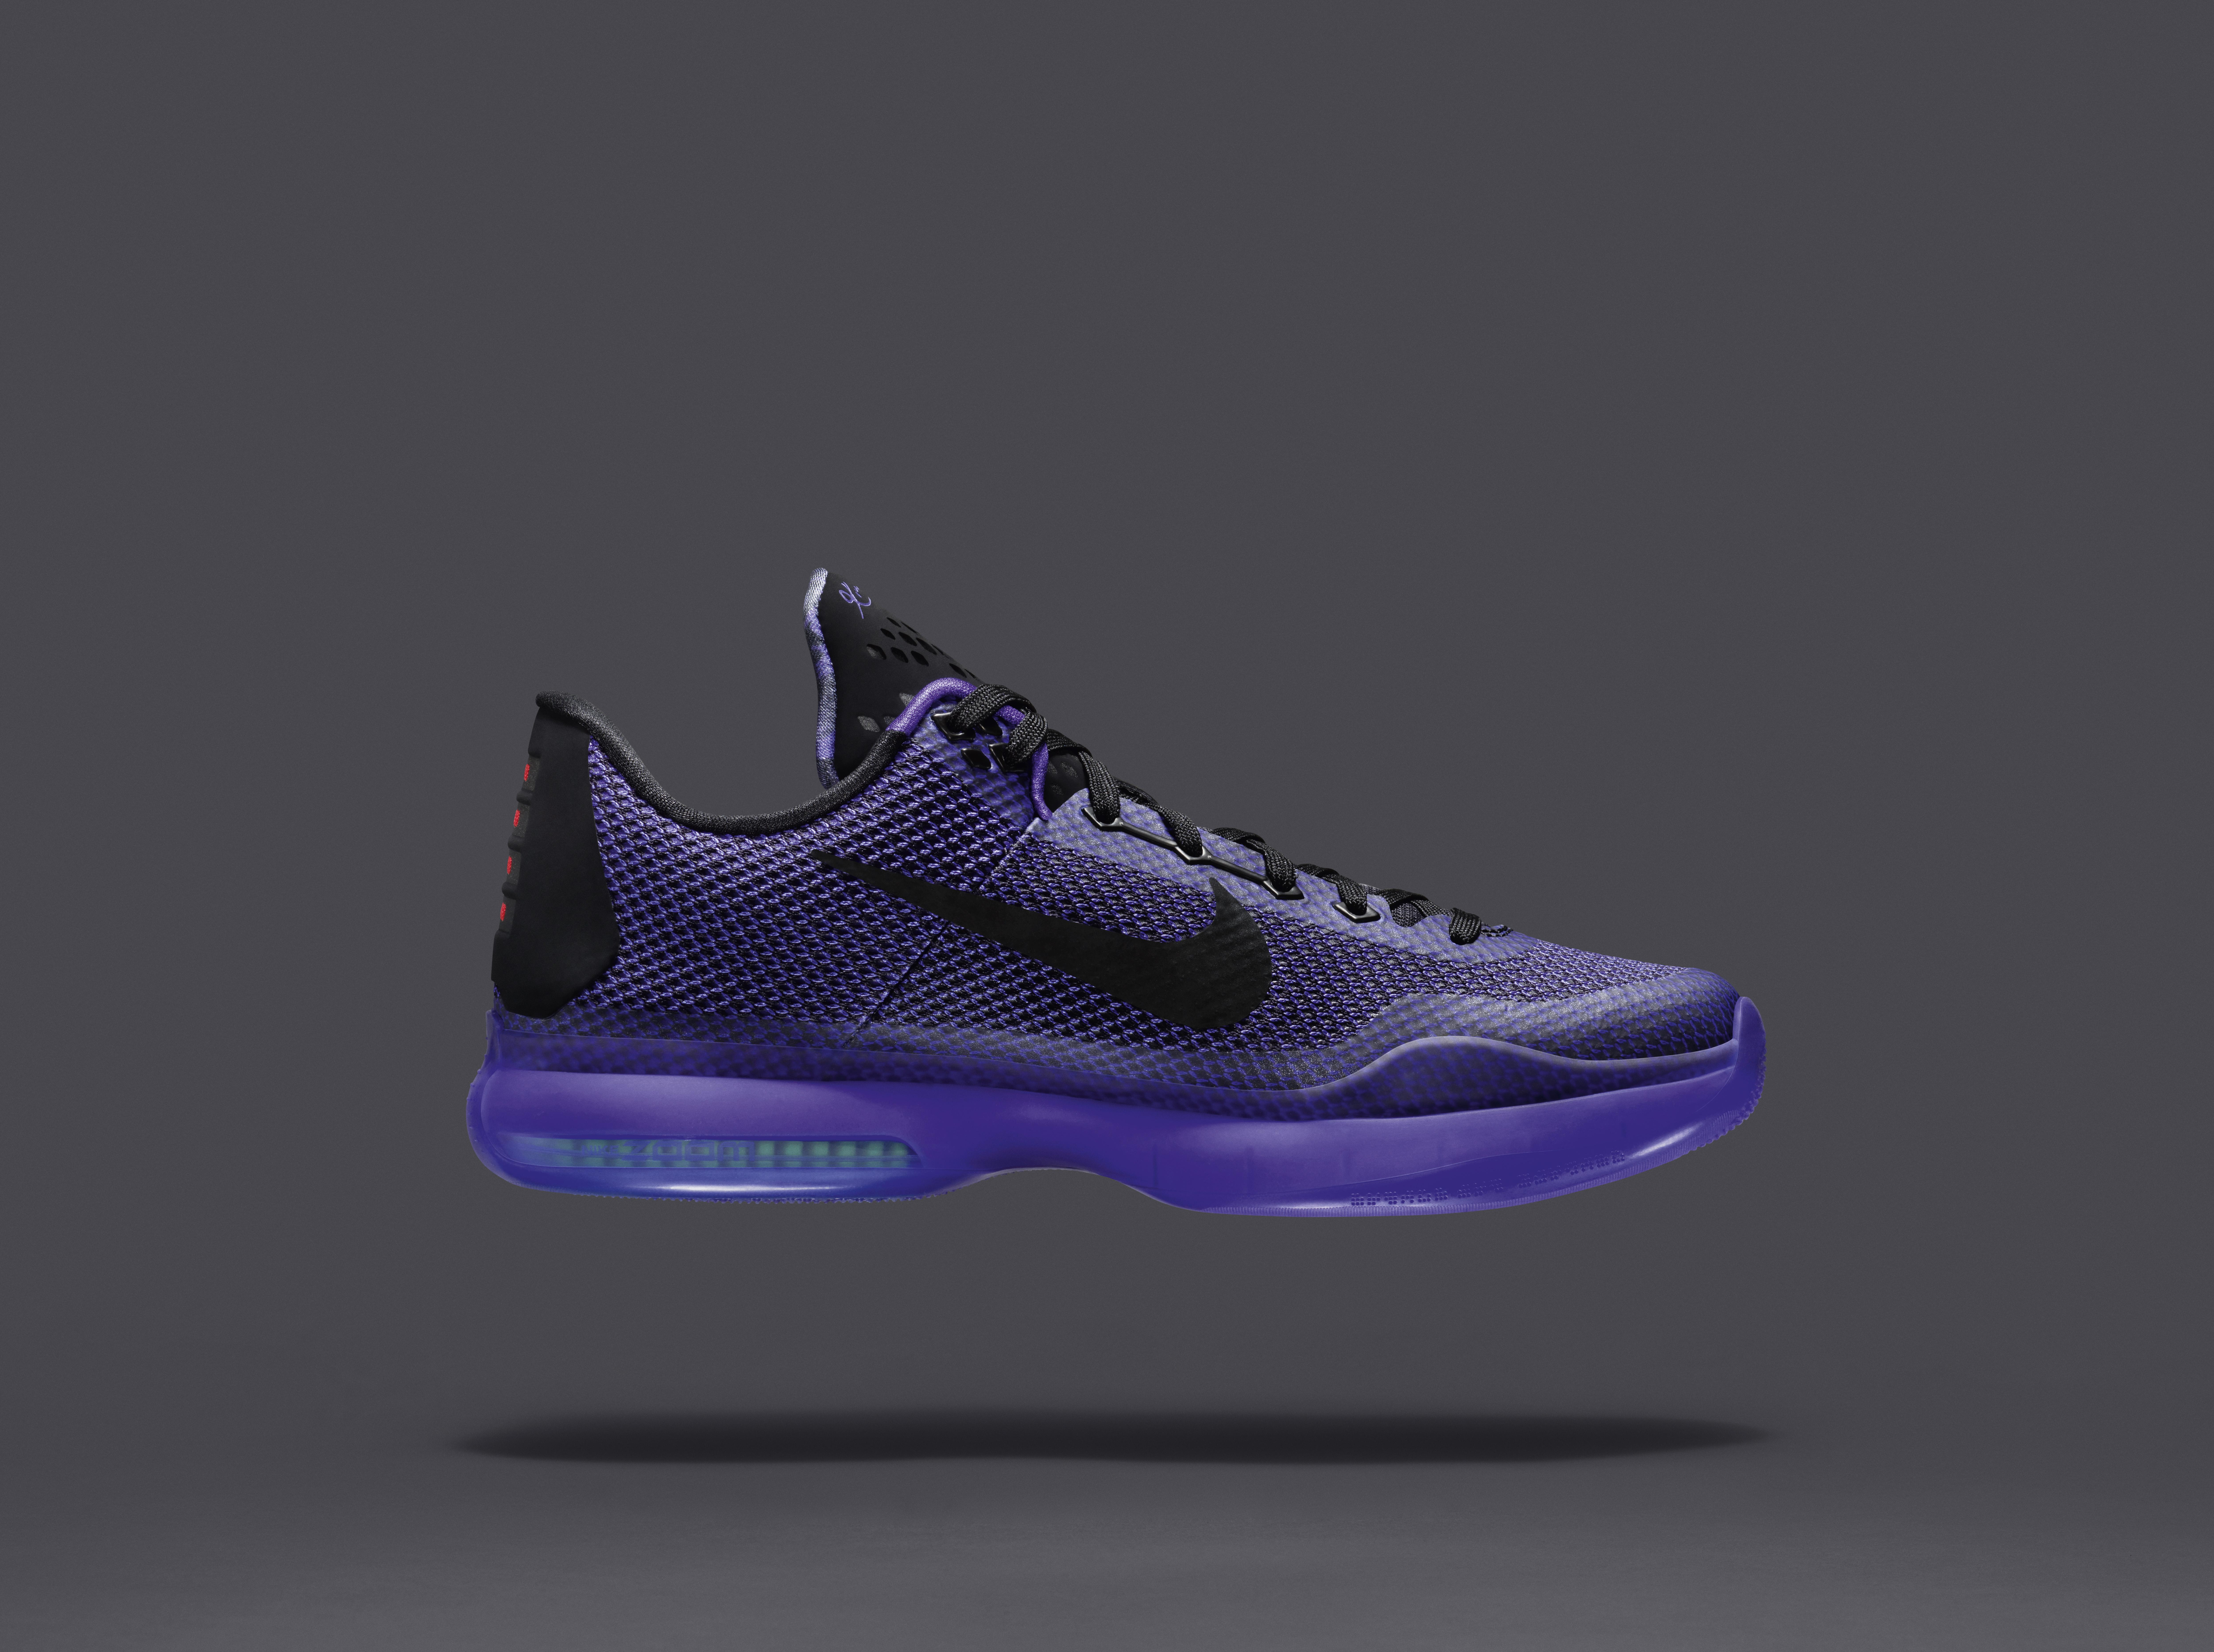 timeless design 334a5 ad598 ... FootLockerUnlockedNikeKobe9EliteBraveBlue3 A Career Marked by Injury  KOBE X Blackout Inspired by Kobe Bryants Relentless Workouts Nike ...